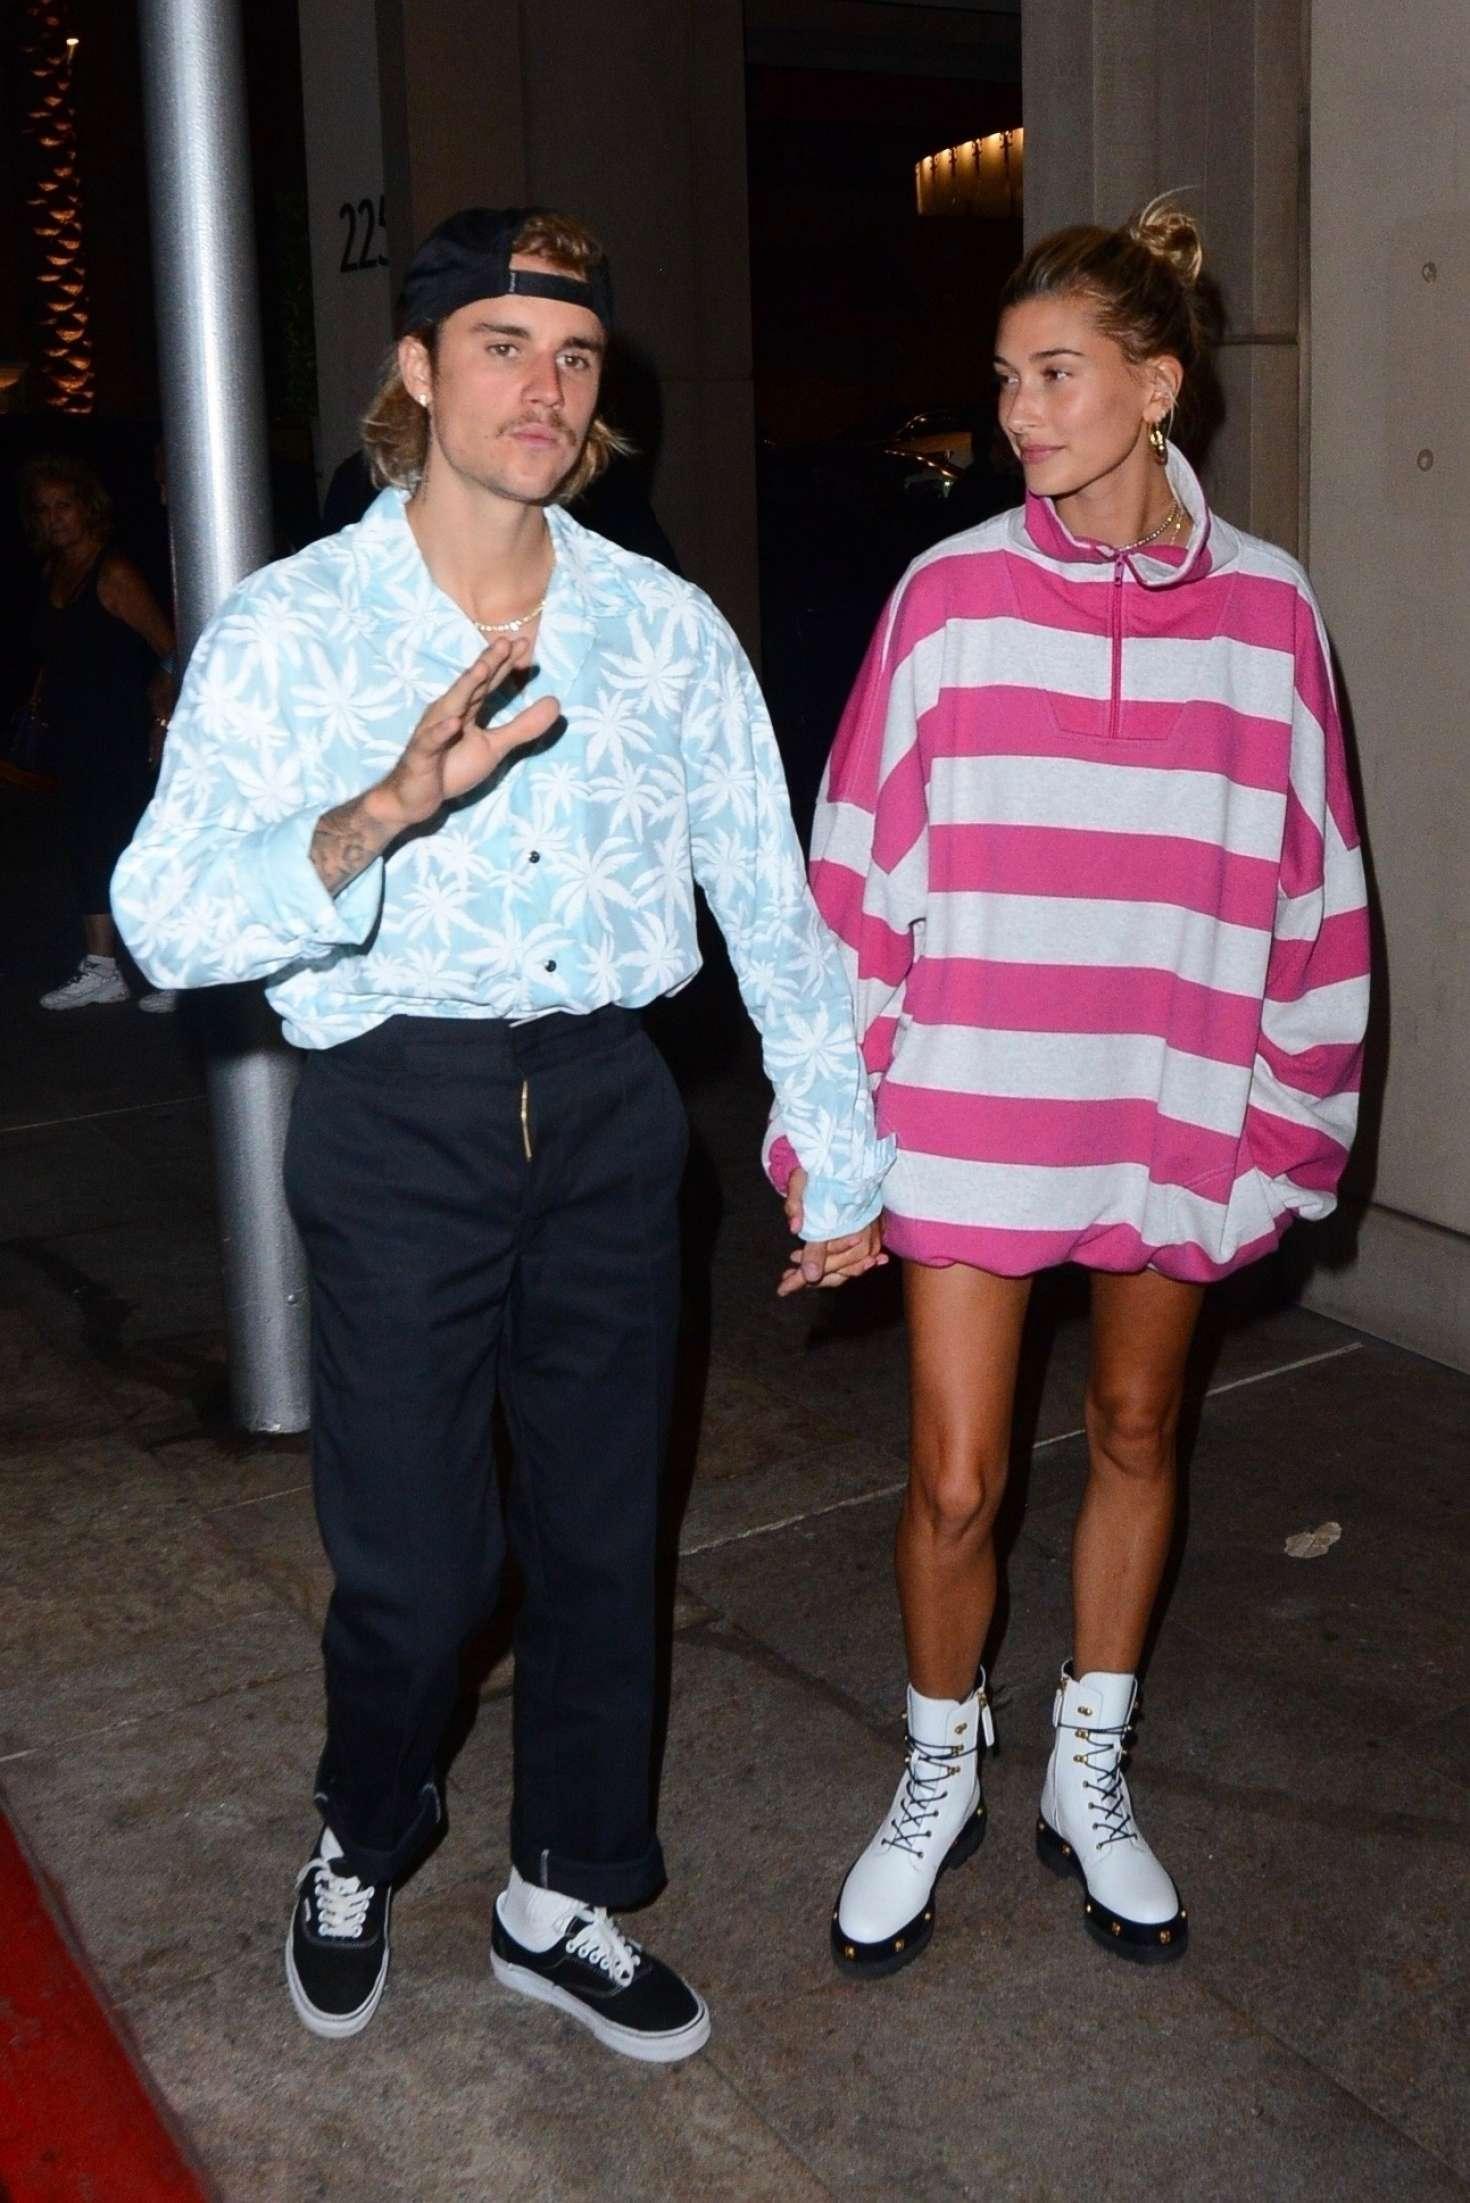 Hailey Baldwin 2018 : Hailey Baldwin and Justin Bieber: Out for a dinner -07